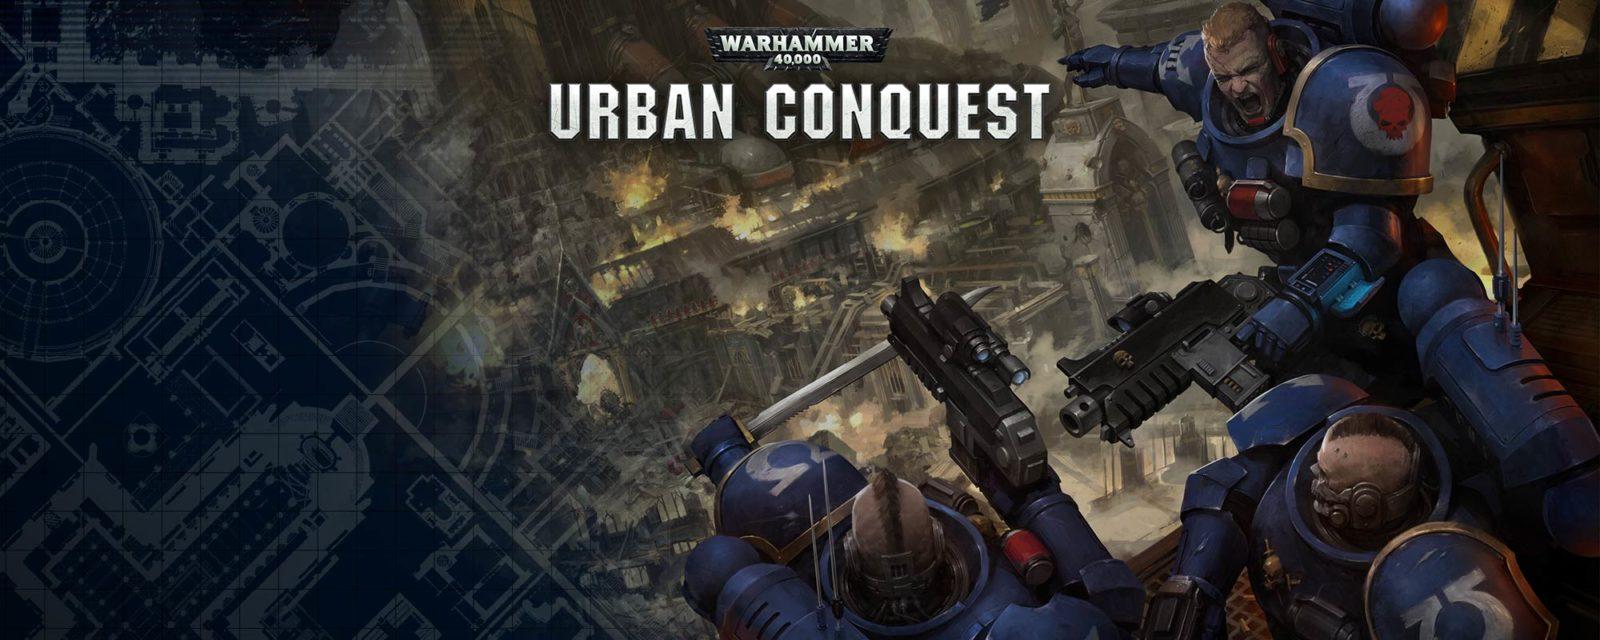 Jan06-UrbanConquest-HeroBanner1yvd-1-160